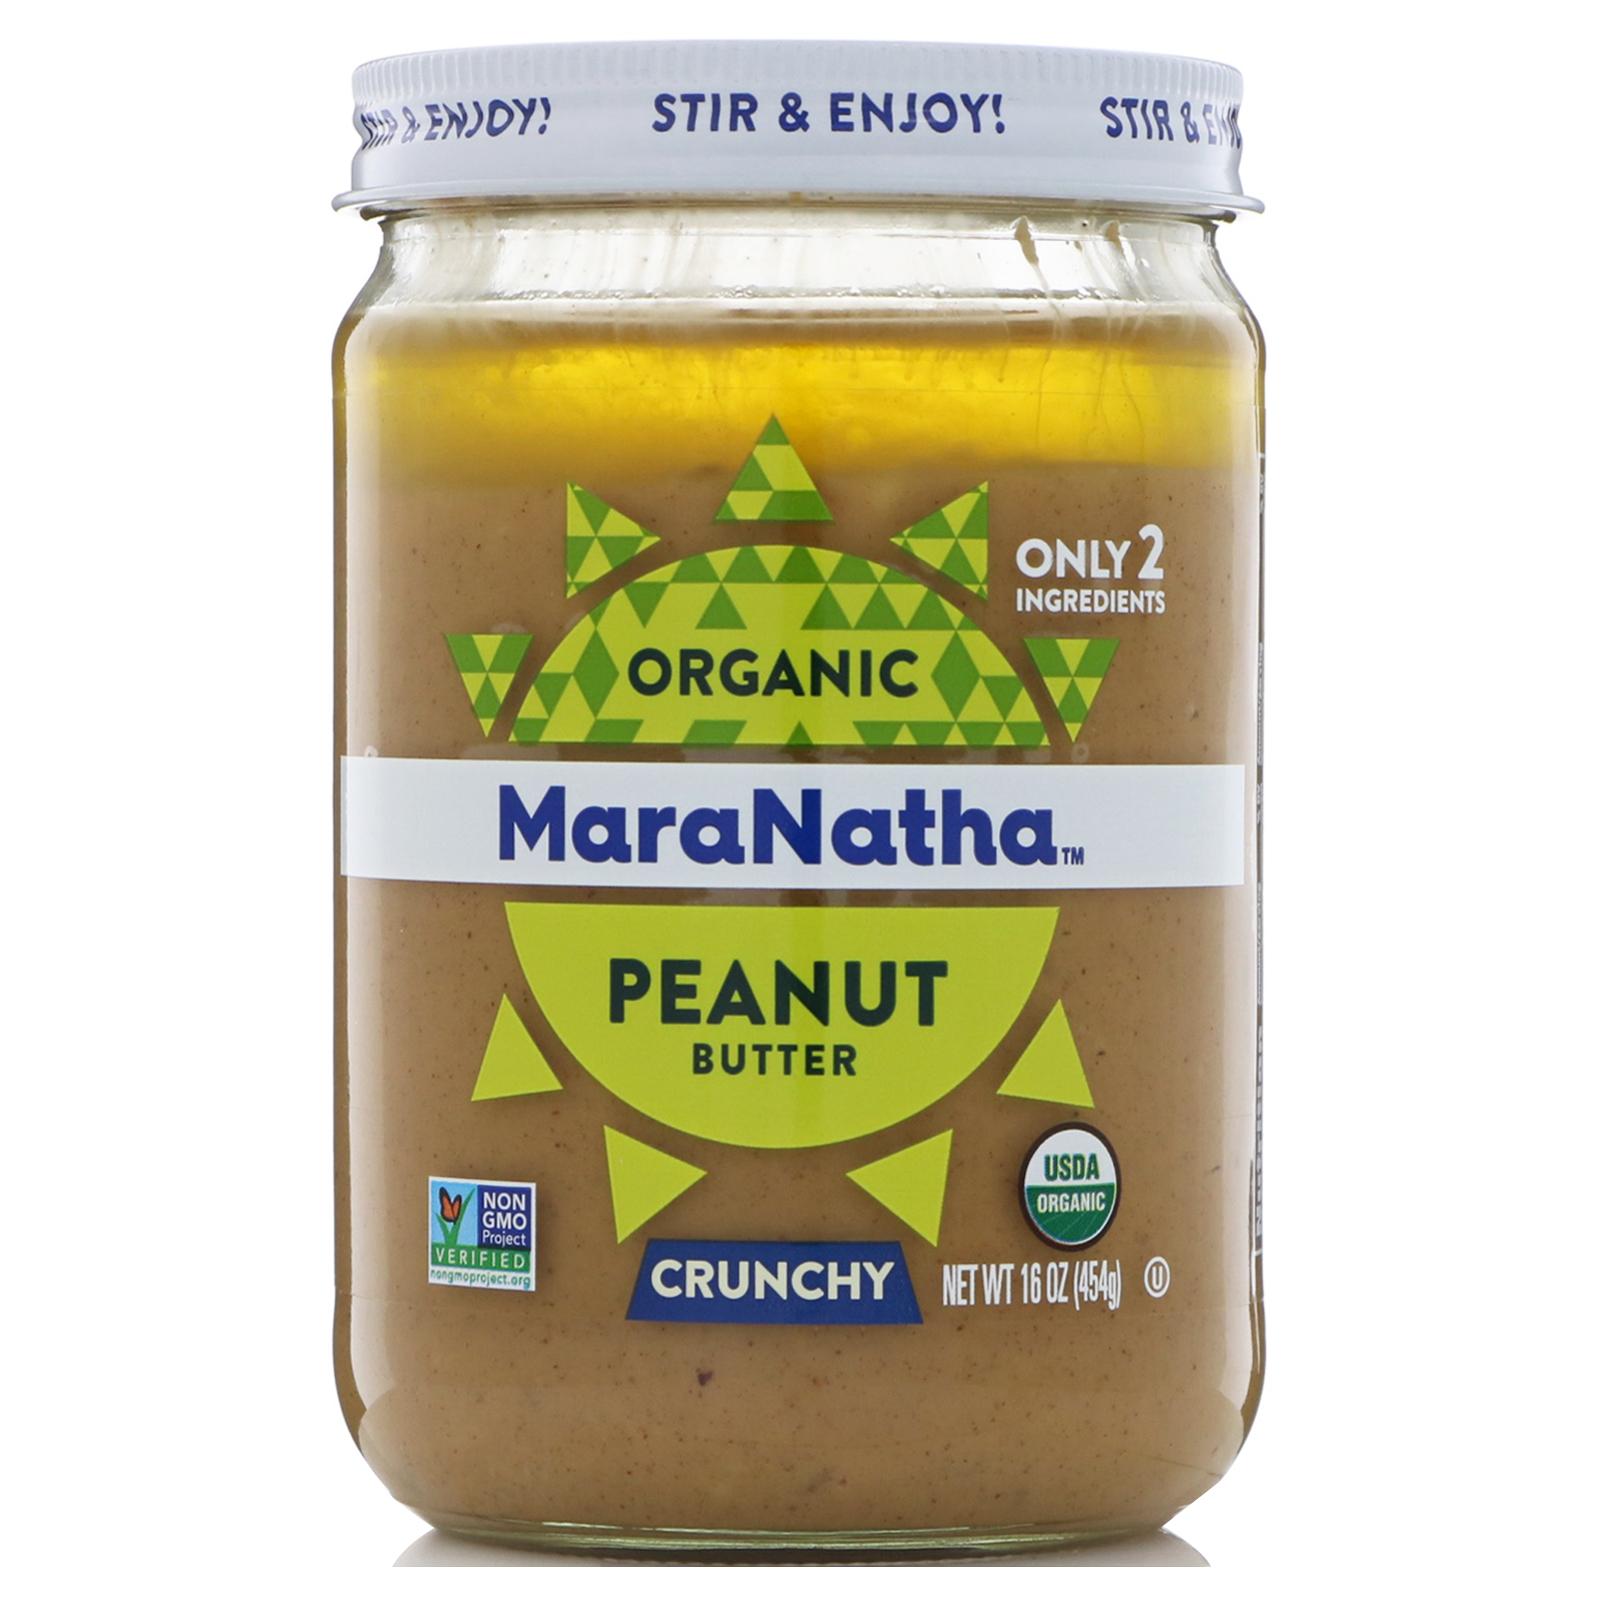 MaraNatha, Mantequilla de maní orgánica, crujiente, 16 oz (454 g ...